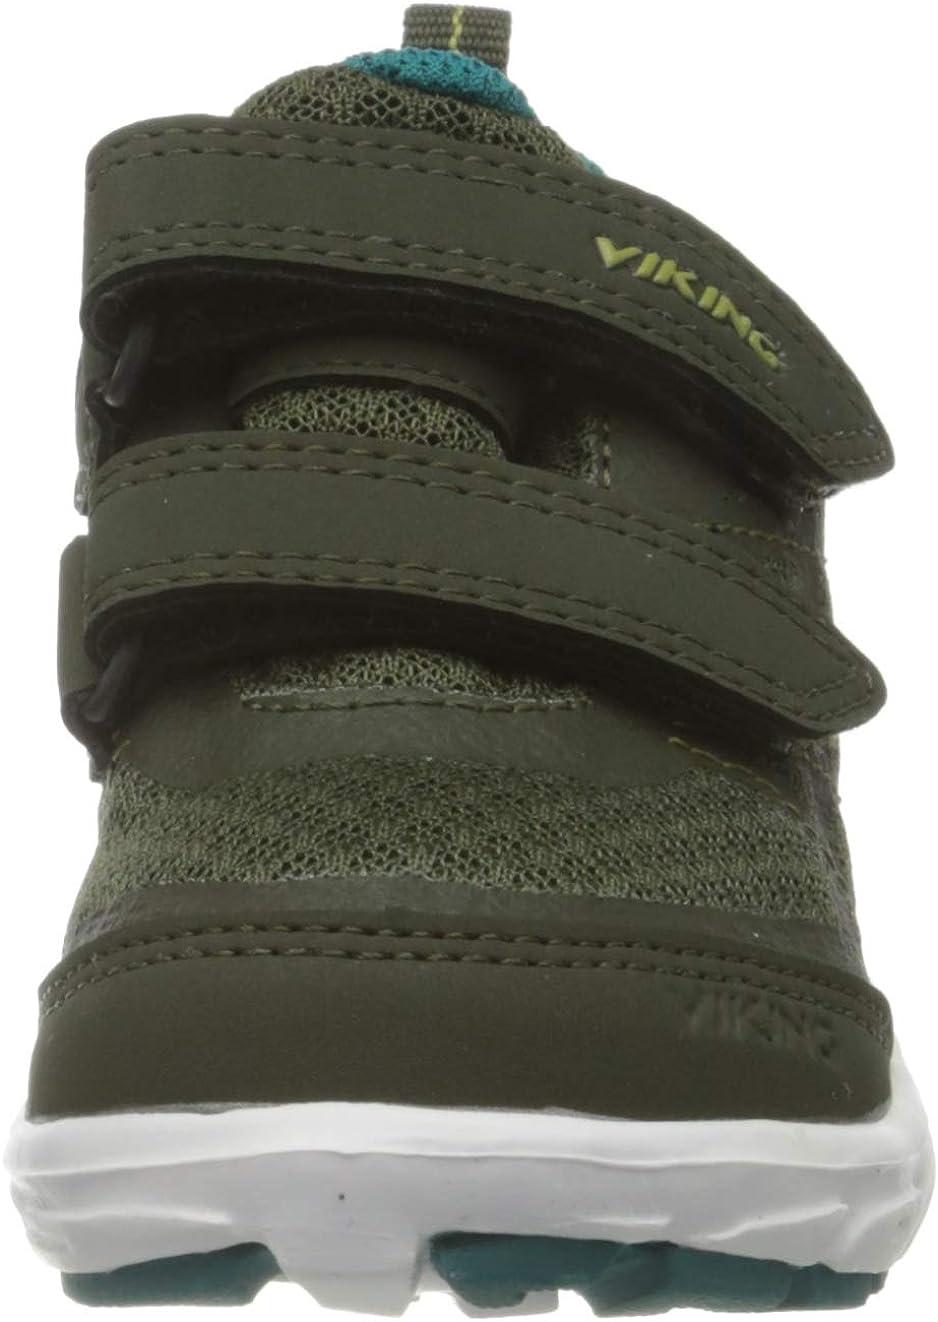 viking Veme Vel GTX Zapatillas Unisex Ni/ños